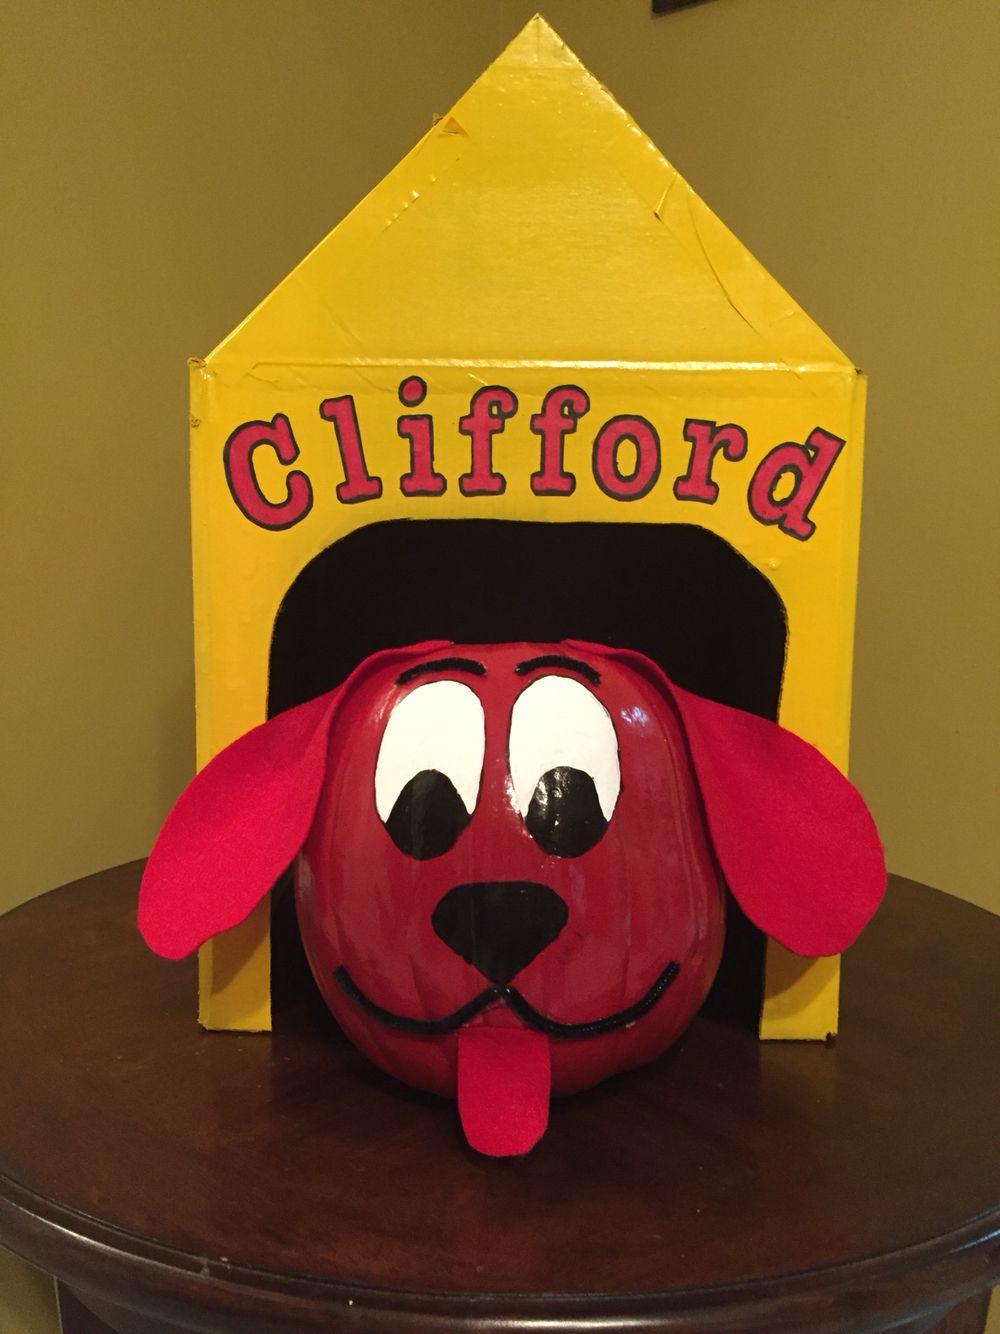 Clifford The Big Red Dog pumpkin | Pumpkin | Pumpkin ...